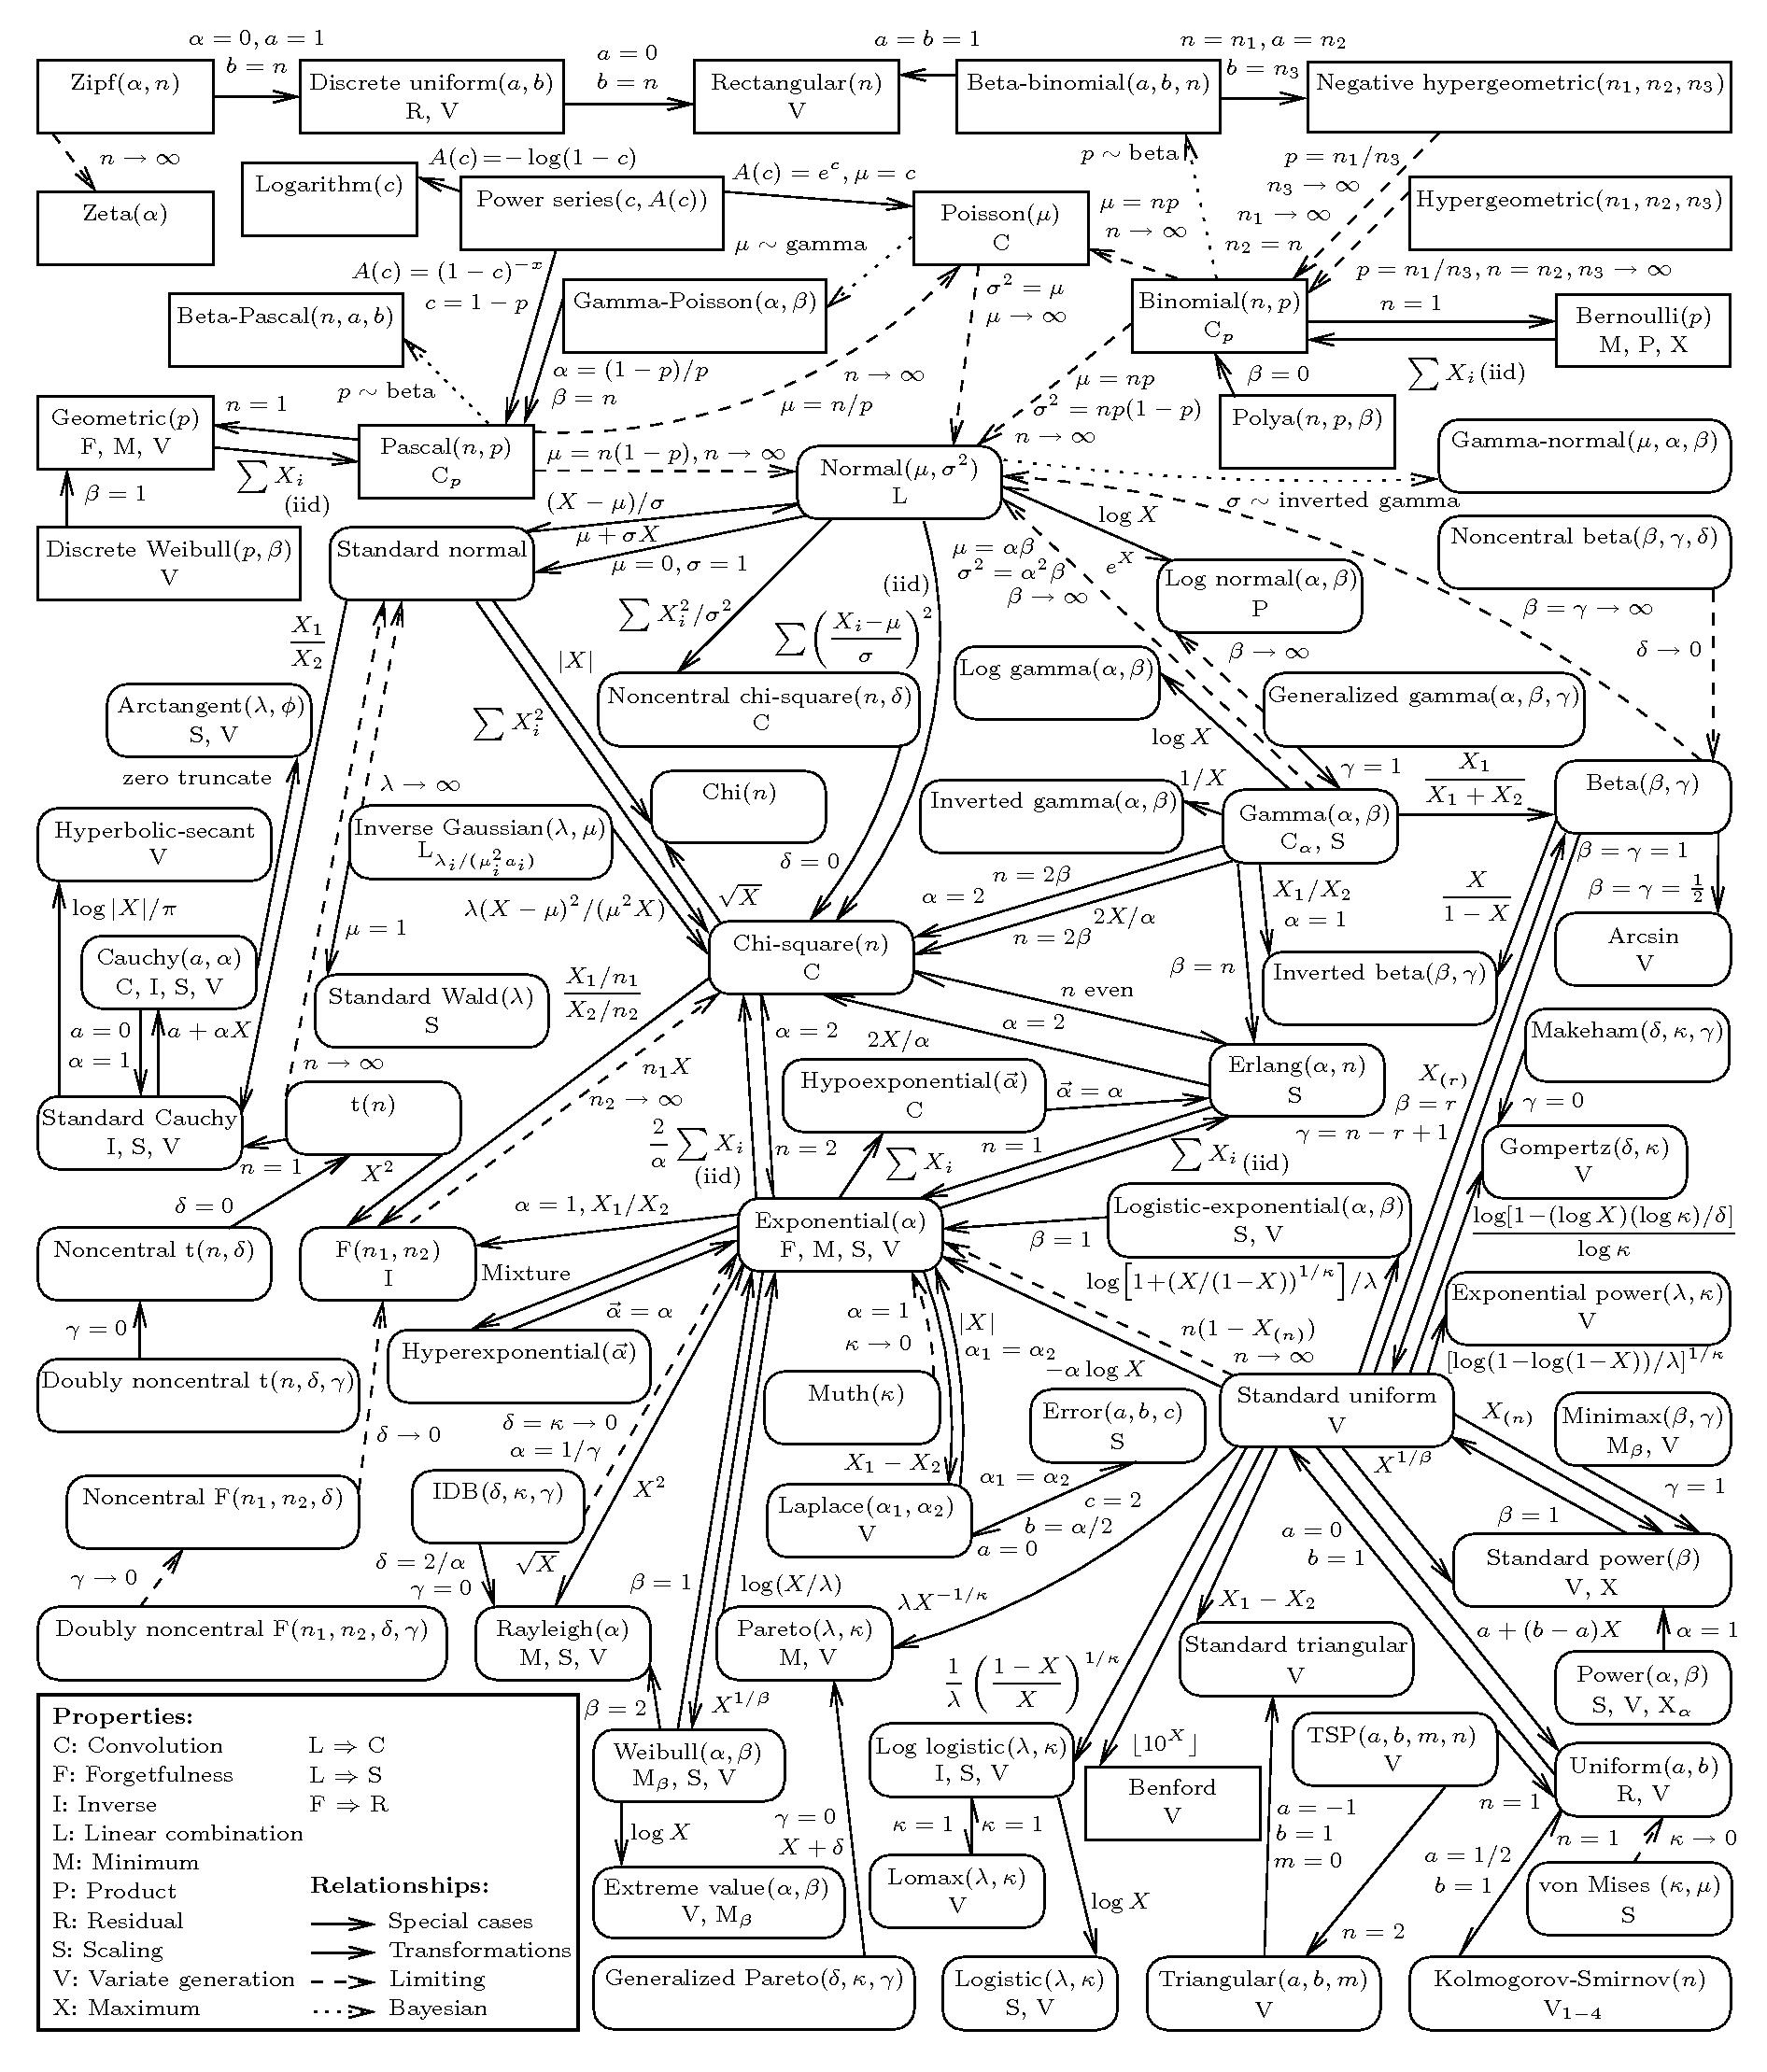 Interactive Univariate Distribution Relationship Chart